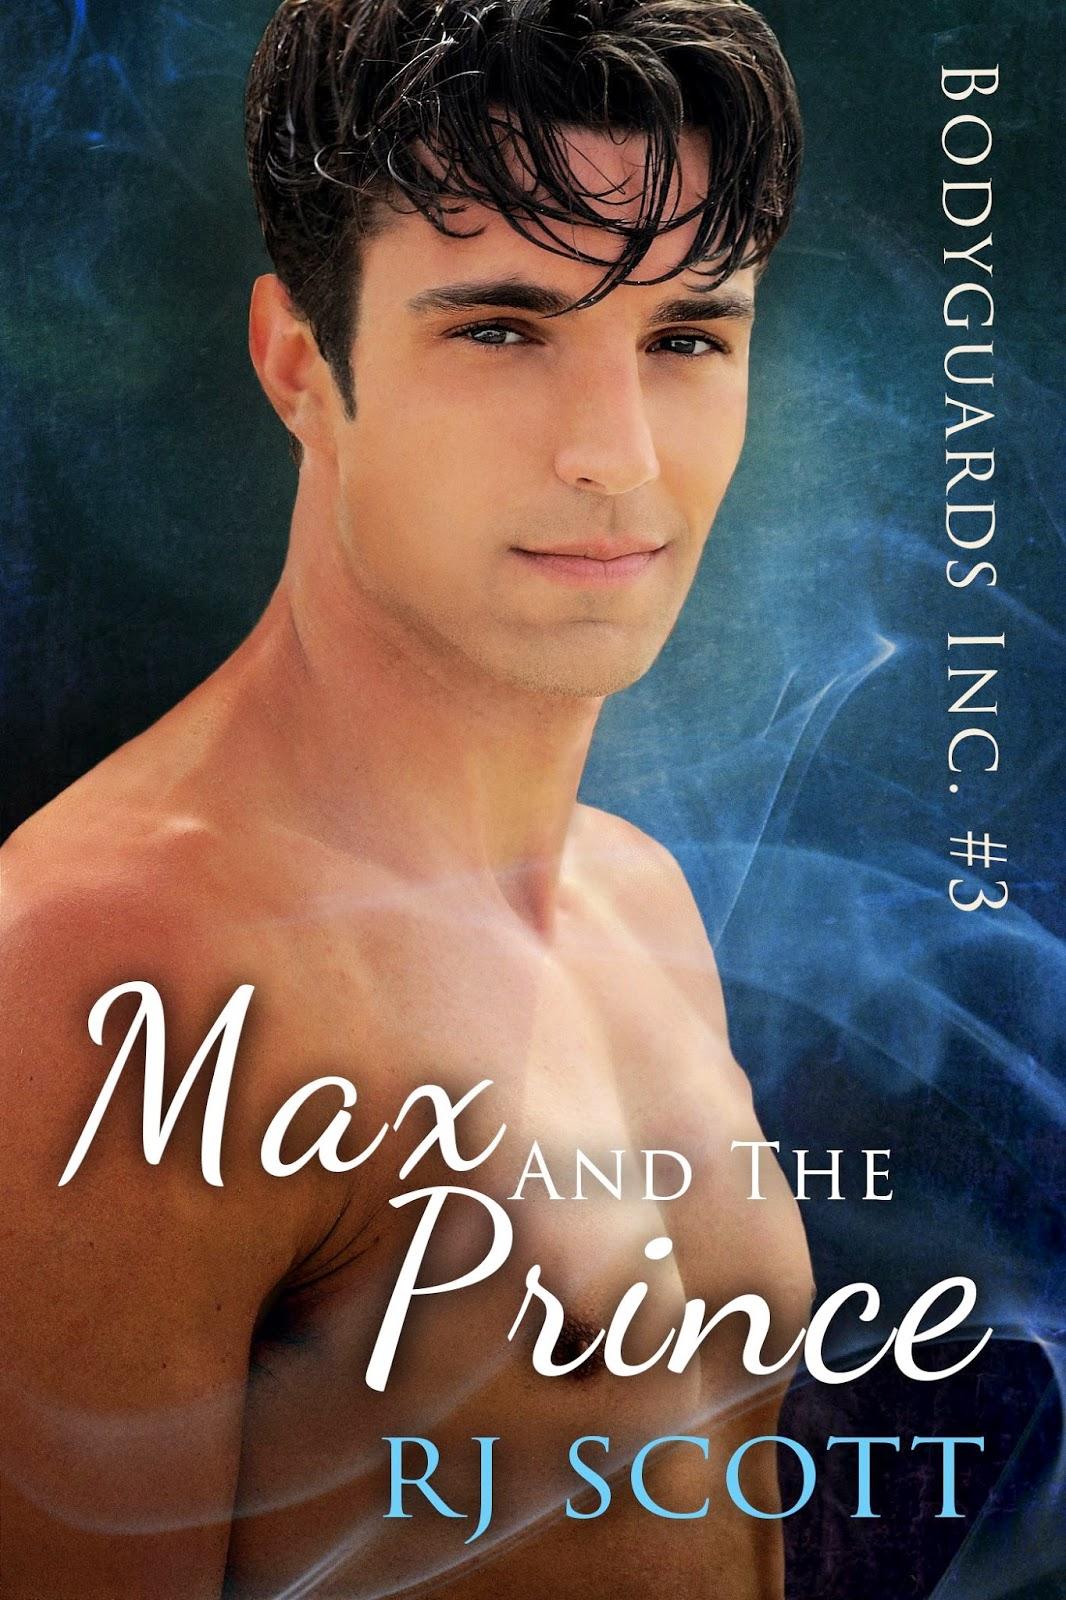 Max and the prince MM romance RJ Scott